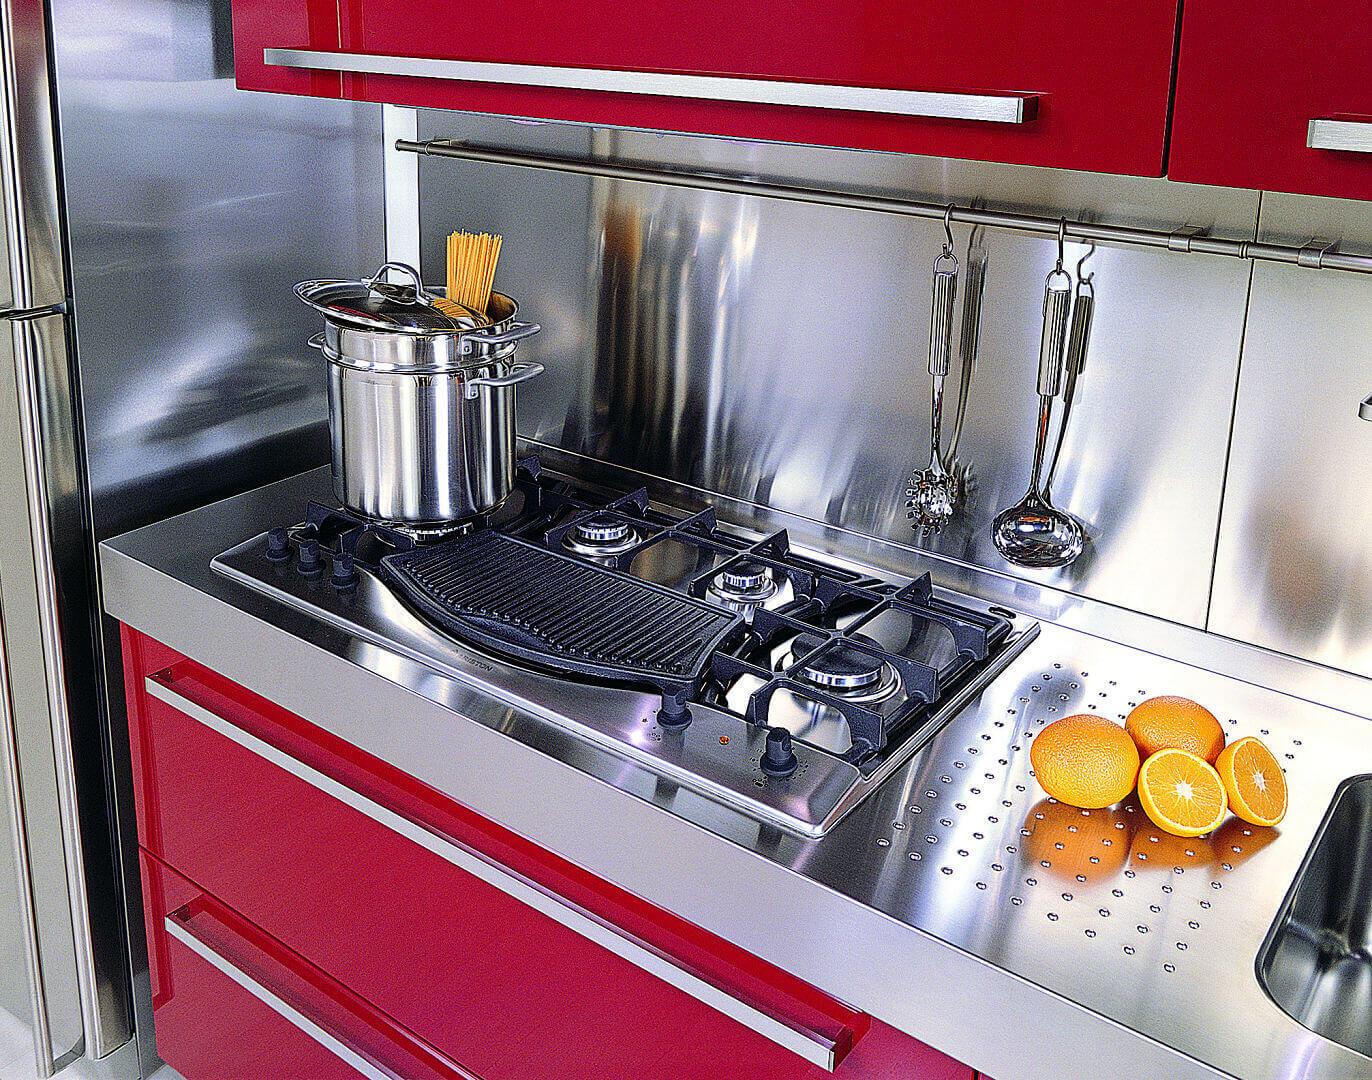 Arca Cucine Italy - Home Kitchen Stainless Steel - Mebel